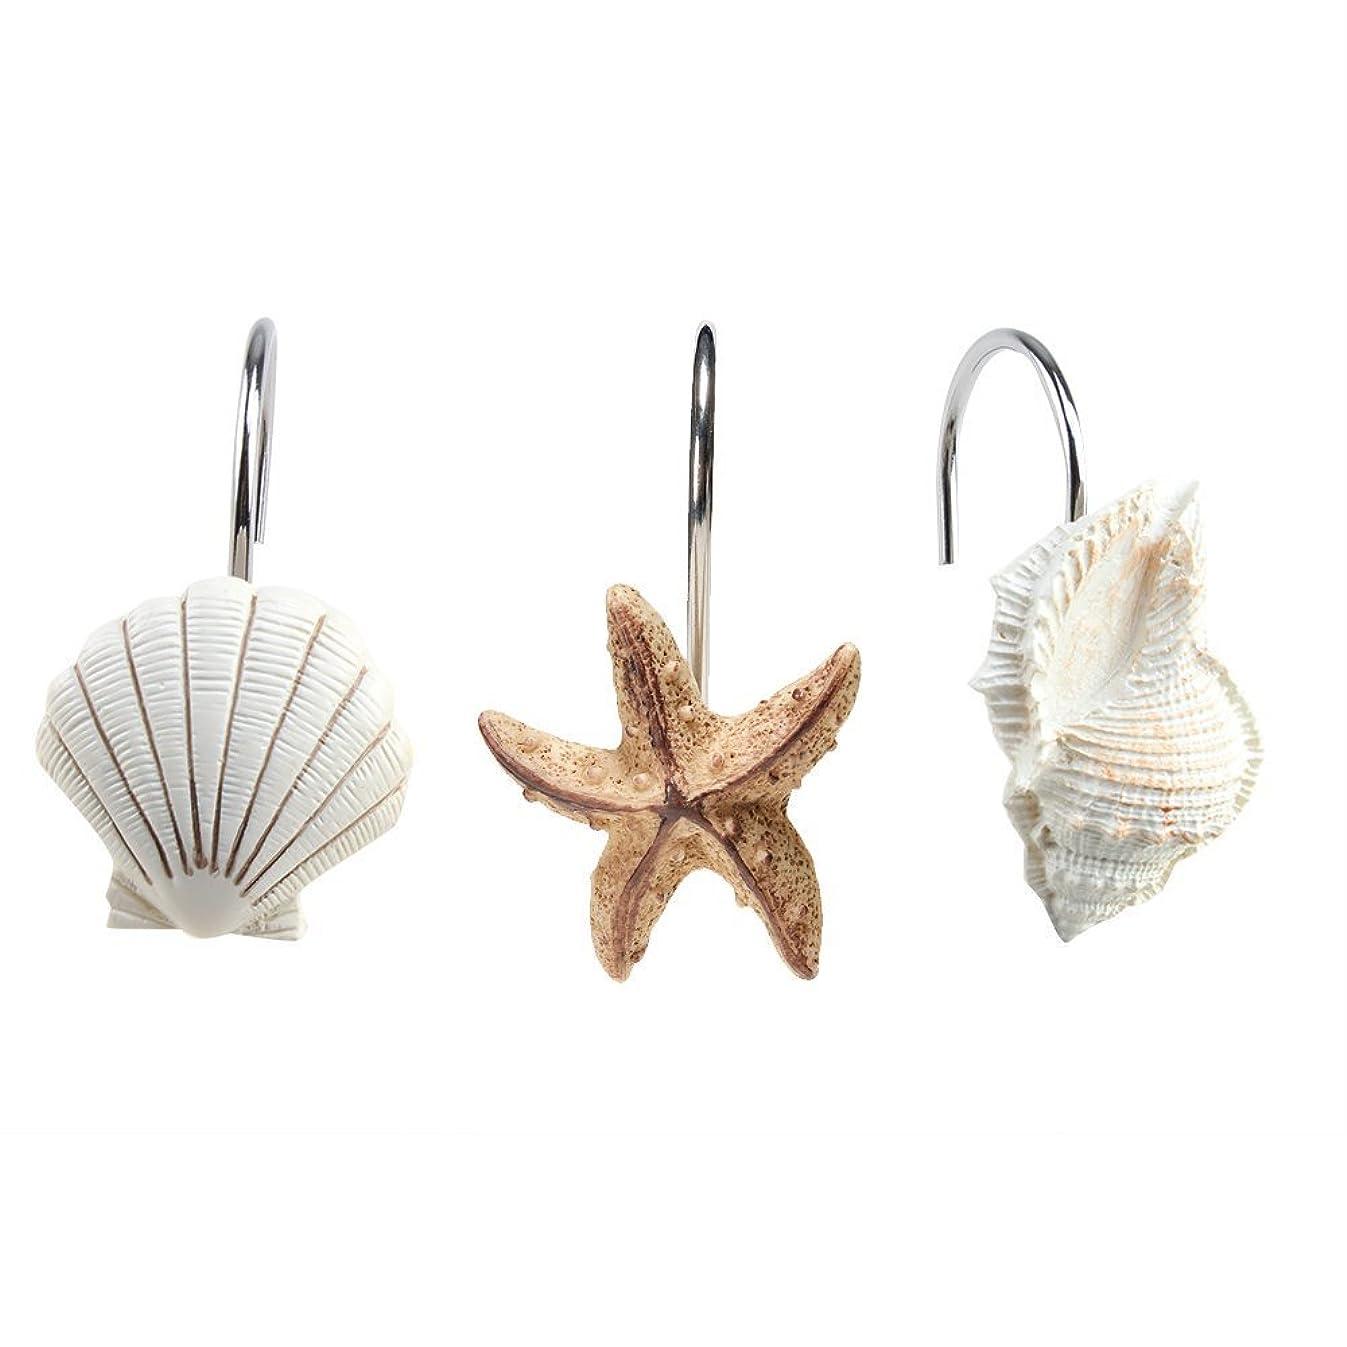 AGPtek? 12 PCS Fashion Decorative Home Bathroom Seashell Shower Curtain Hooks (Seashell: Light Brown; Starfish: Tan; Conch: Light Brown)